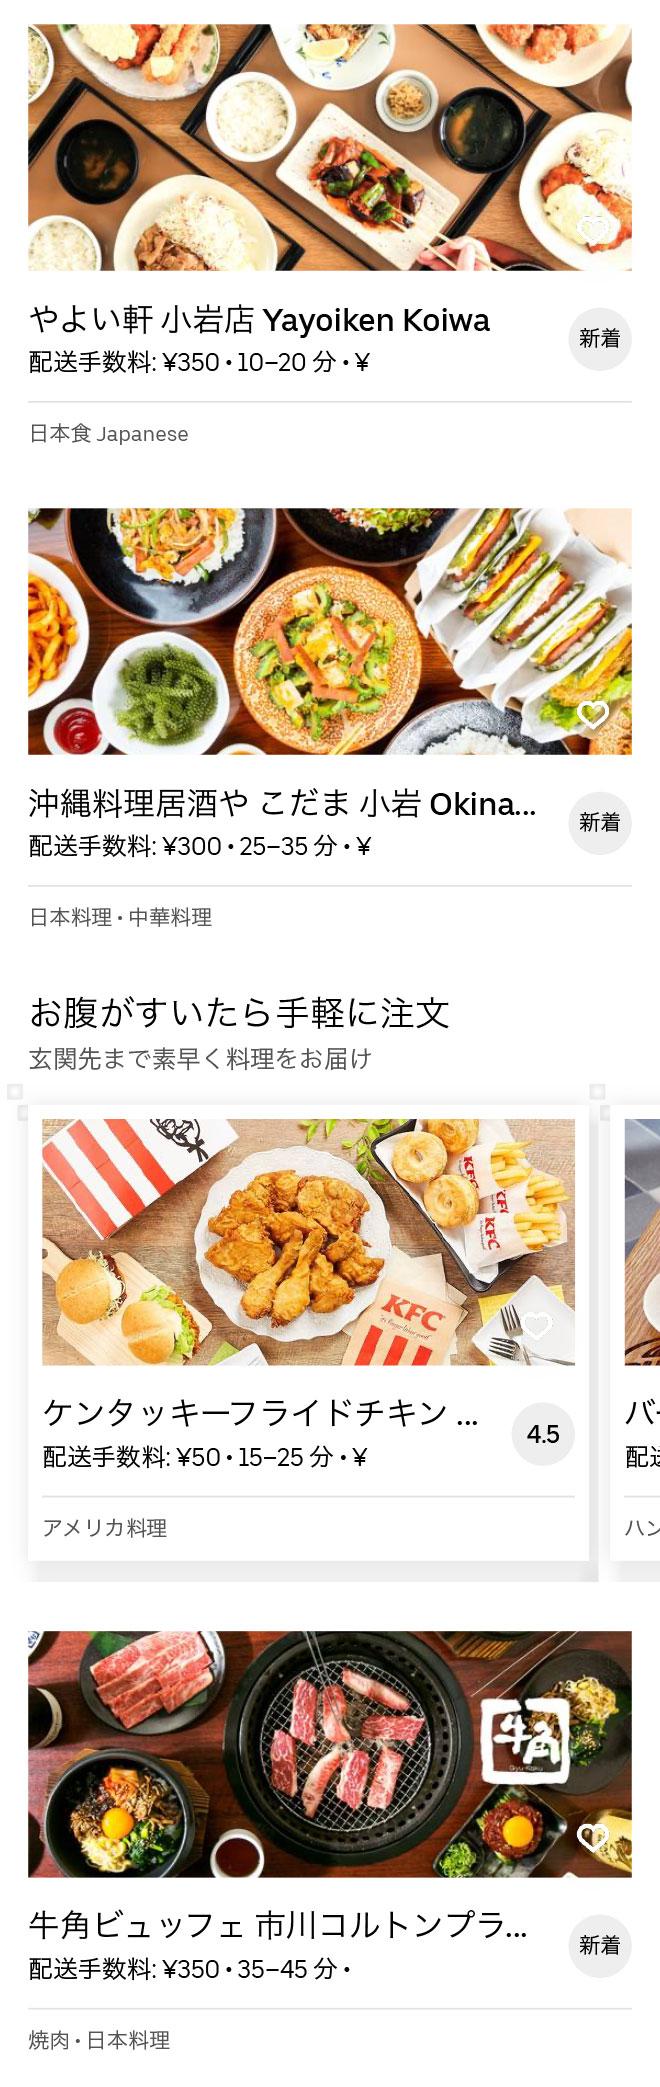 Ichikawa menu 2004 01